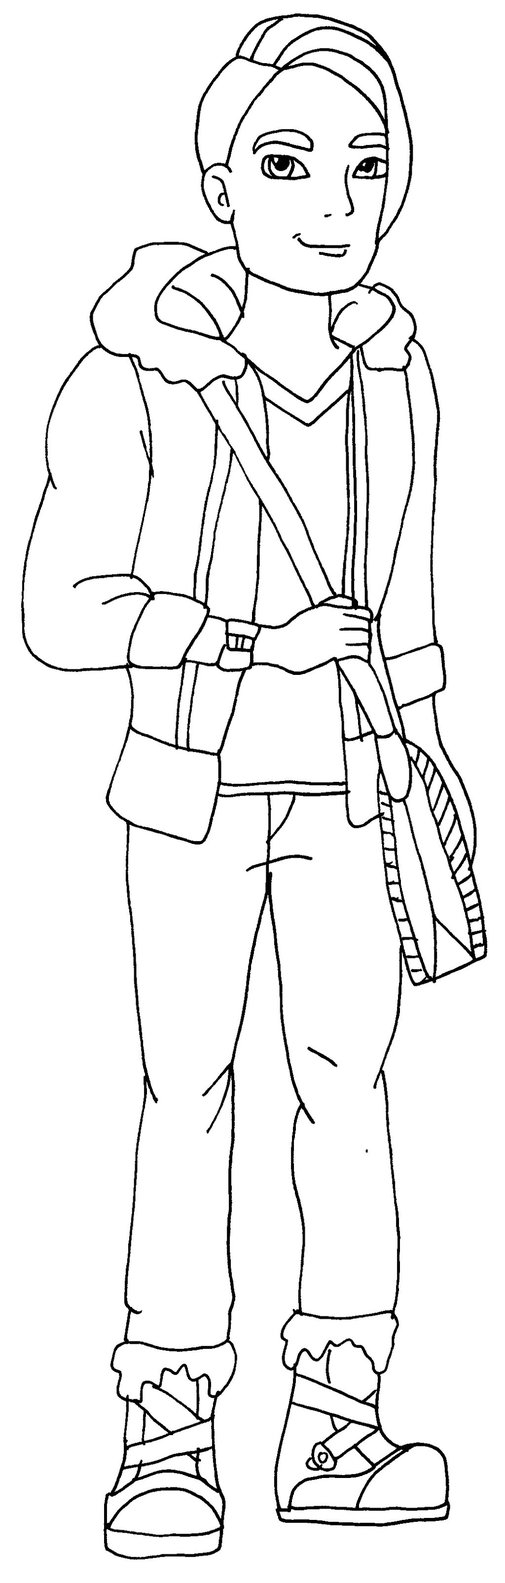 dibujo hunter huntsman